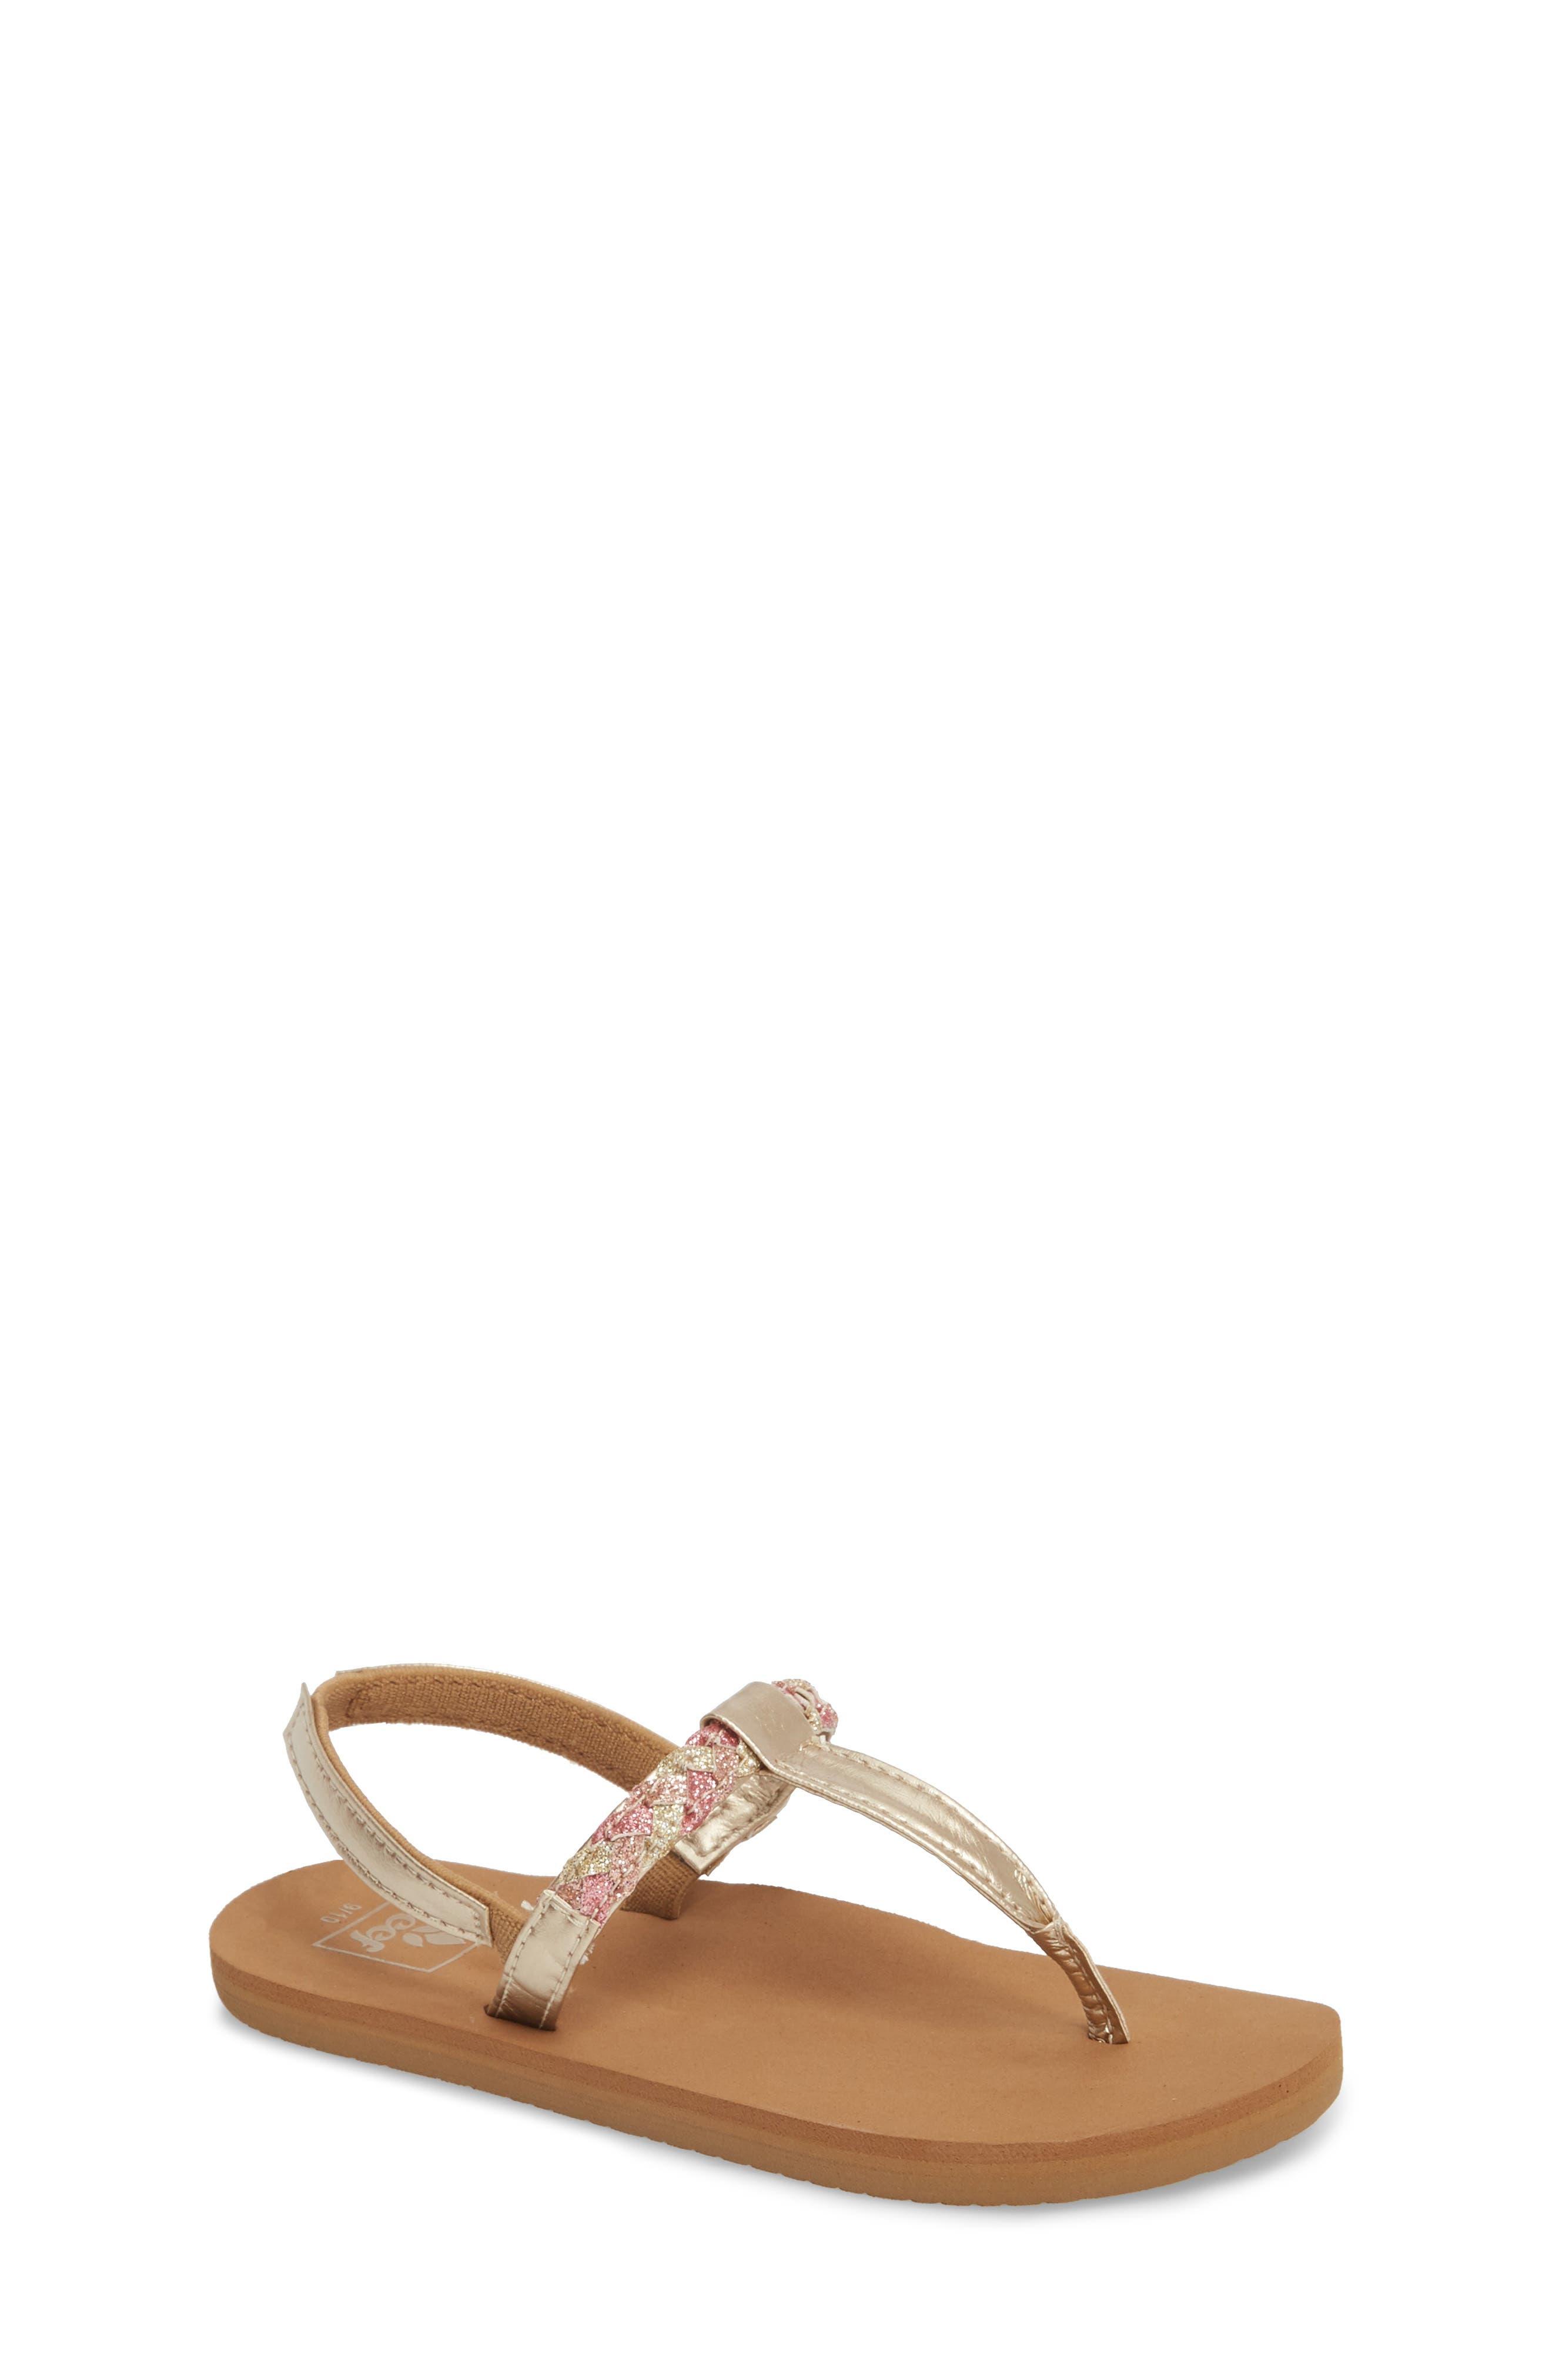 REEF, Little Twisted T-Strap Sandal, Main thumbnail 1, color, TAN